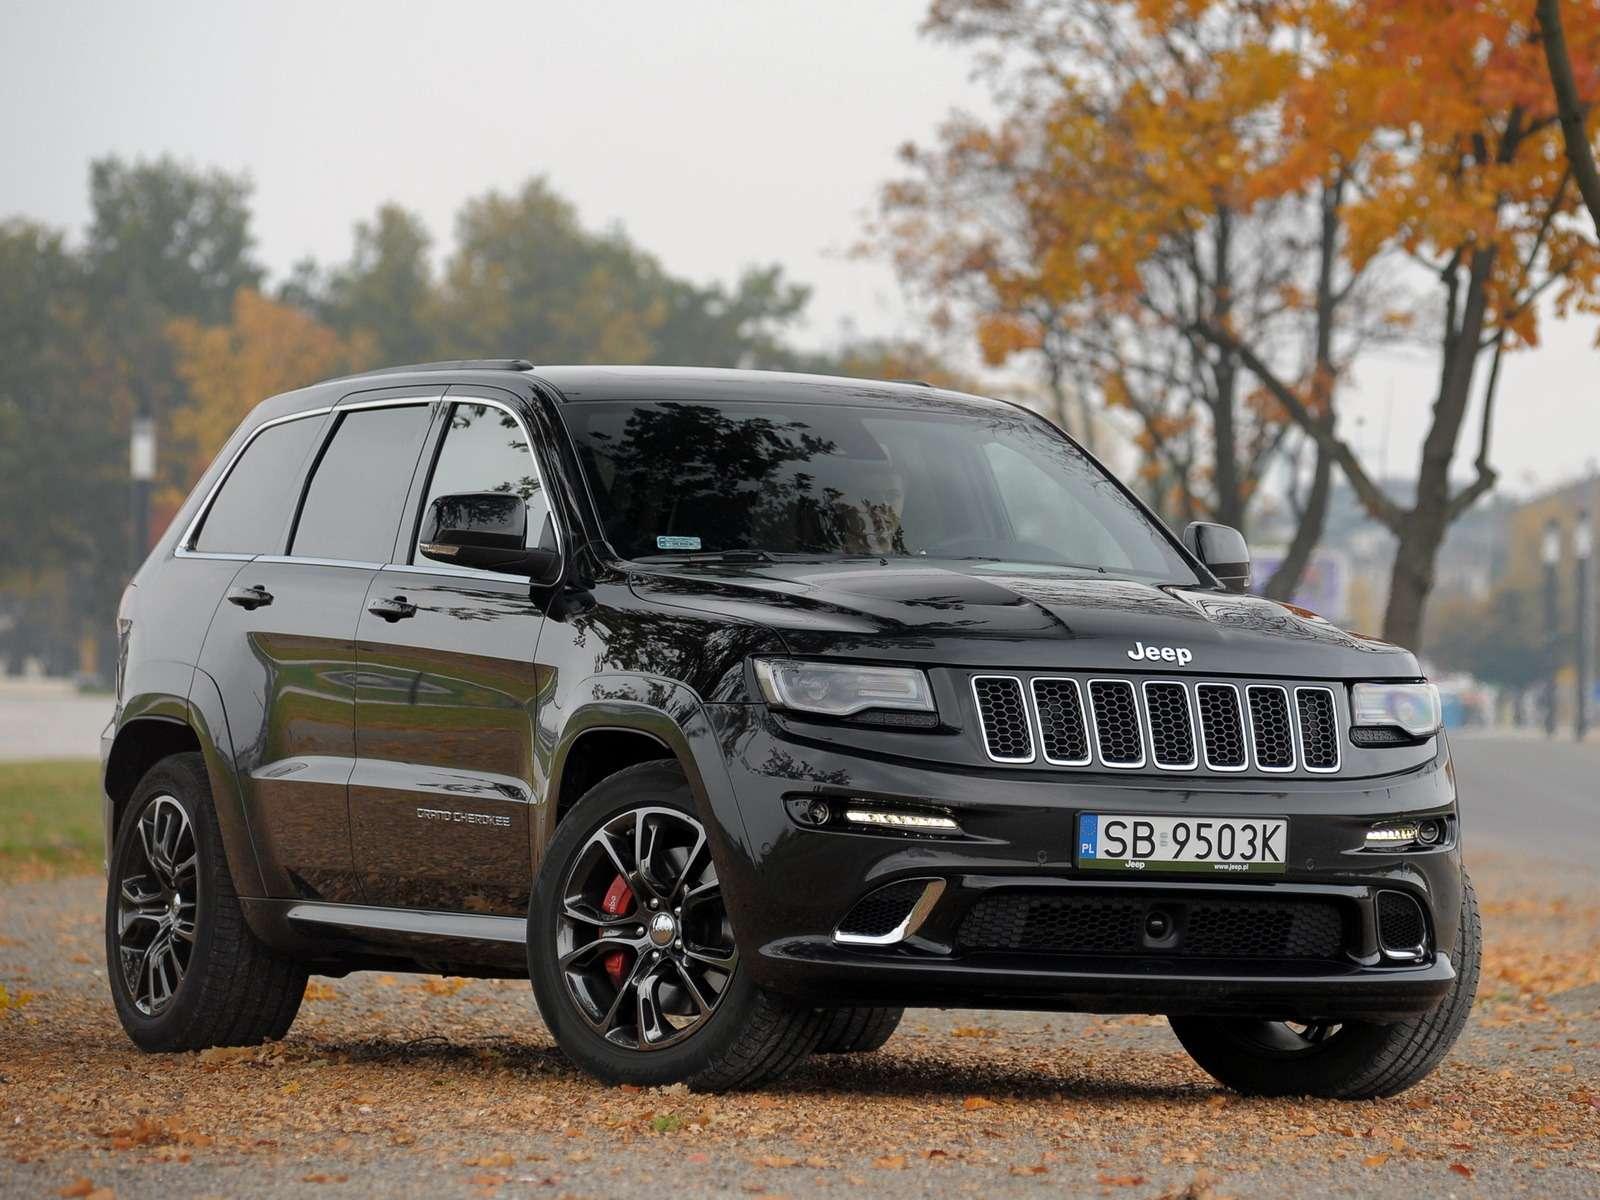 jeep_grand_cherokee_srt_eu-spec_6